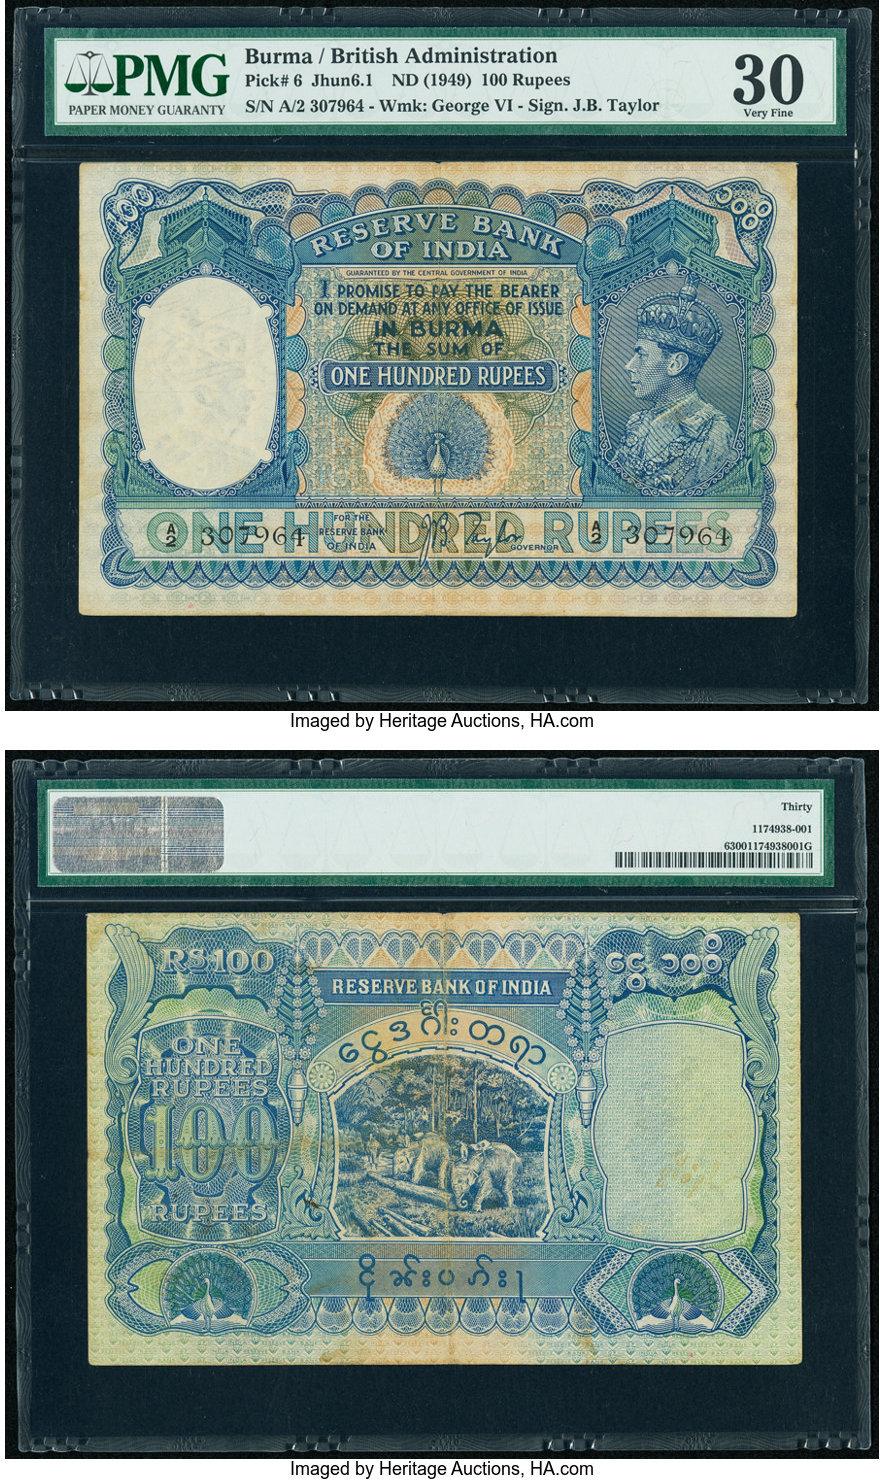 1938 BURMA BRITISH INDIA 5 RUPEE P-4 KING GEORGE VI MYANMAR PEACOCK BANKNOTE VF